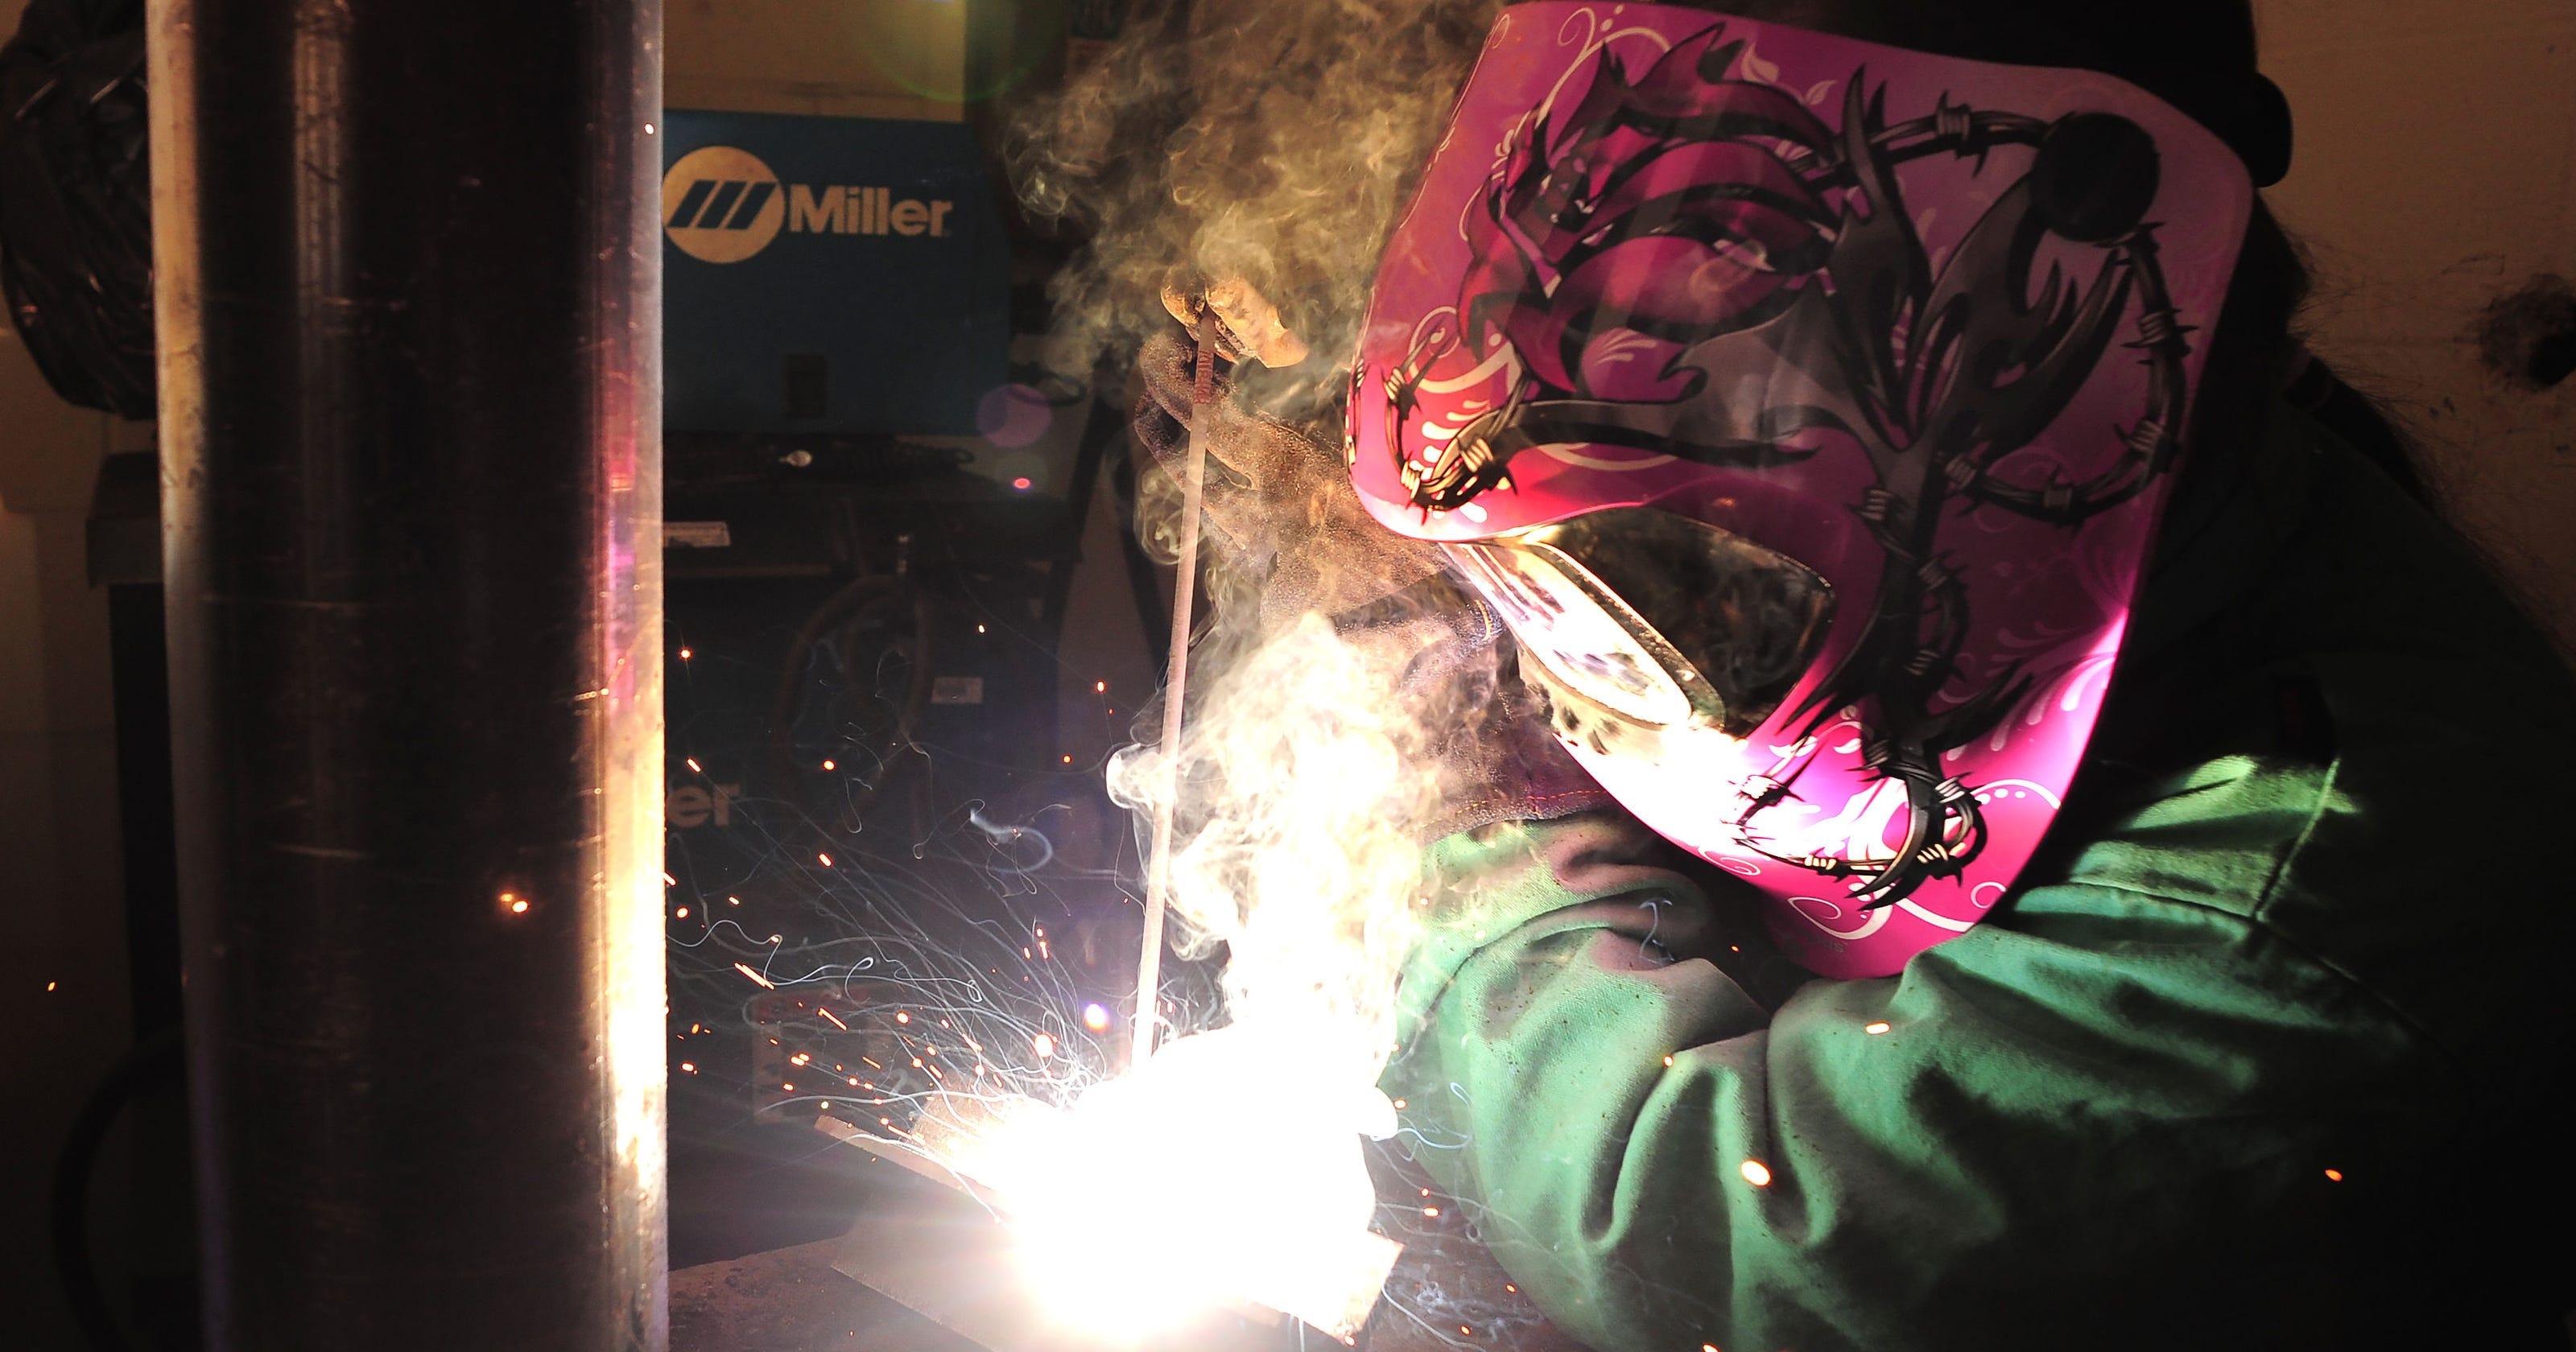 Fiery Bright Future For Girls Learning Welding